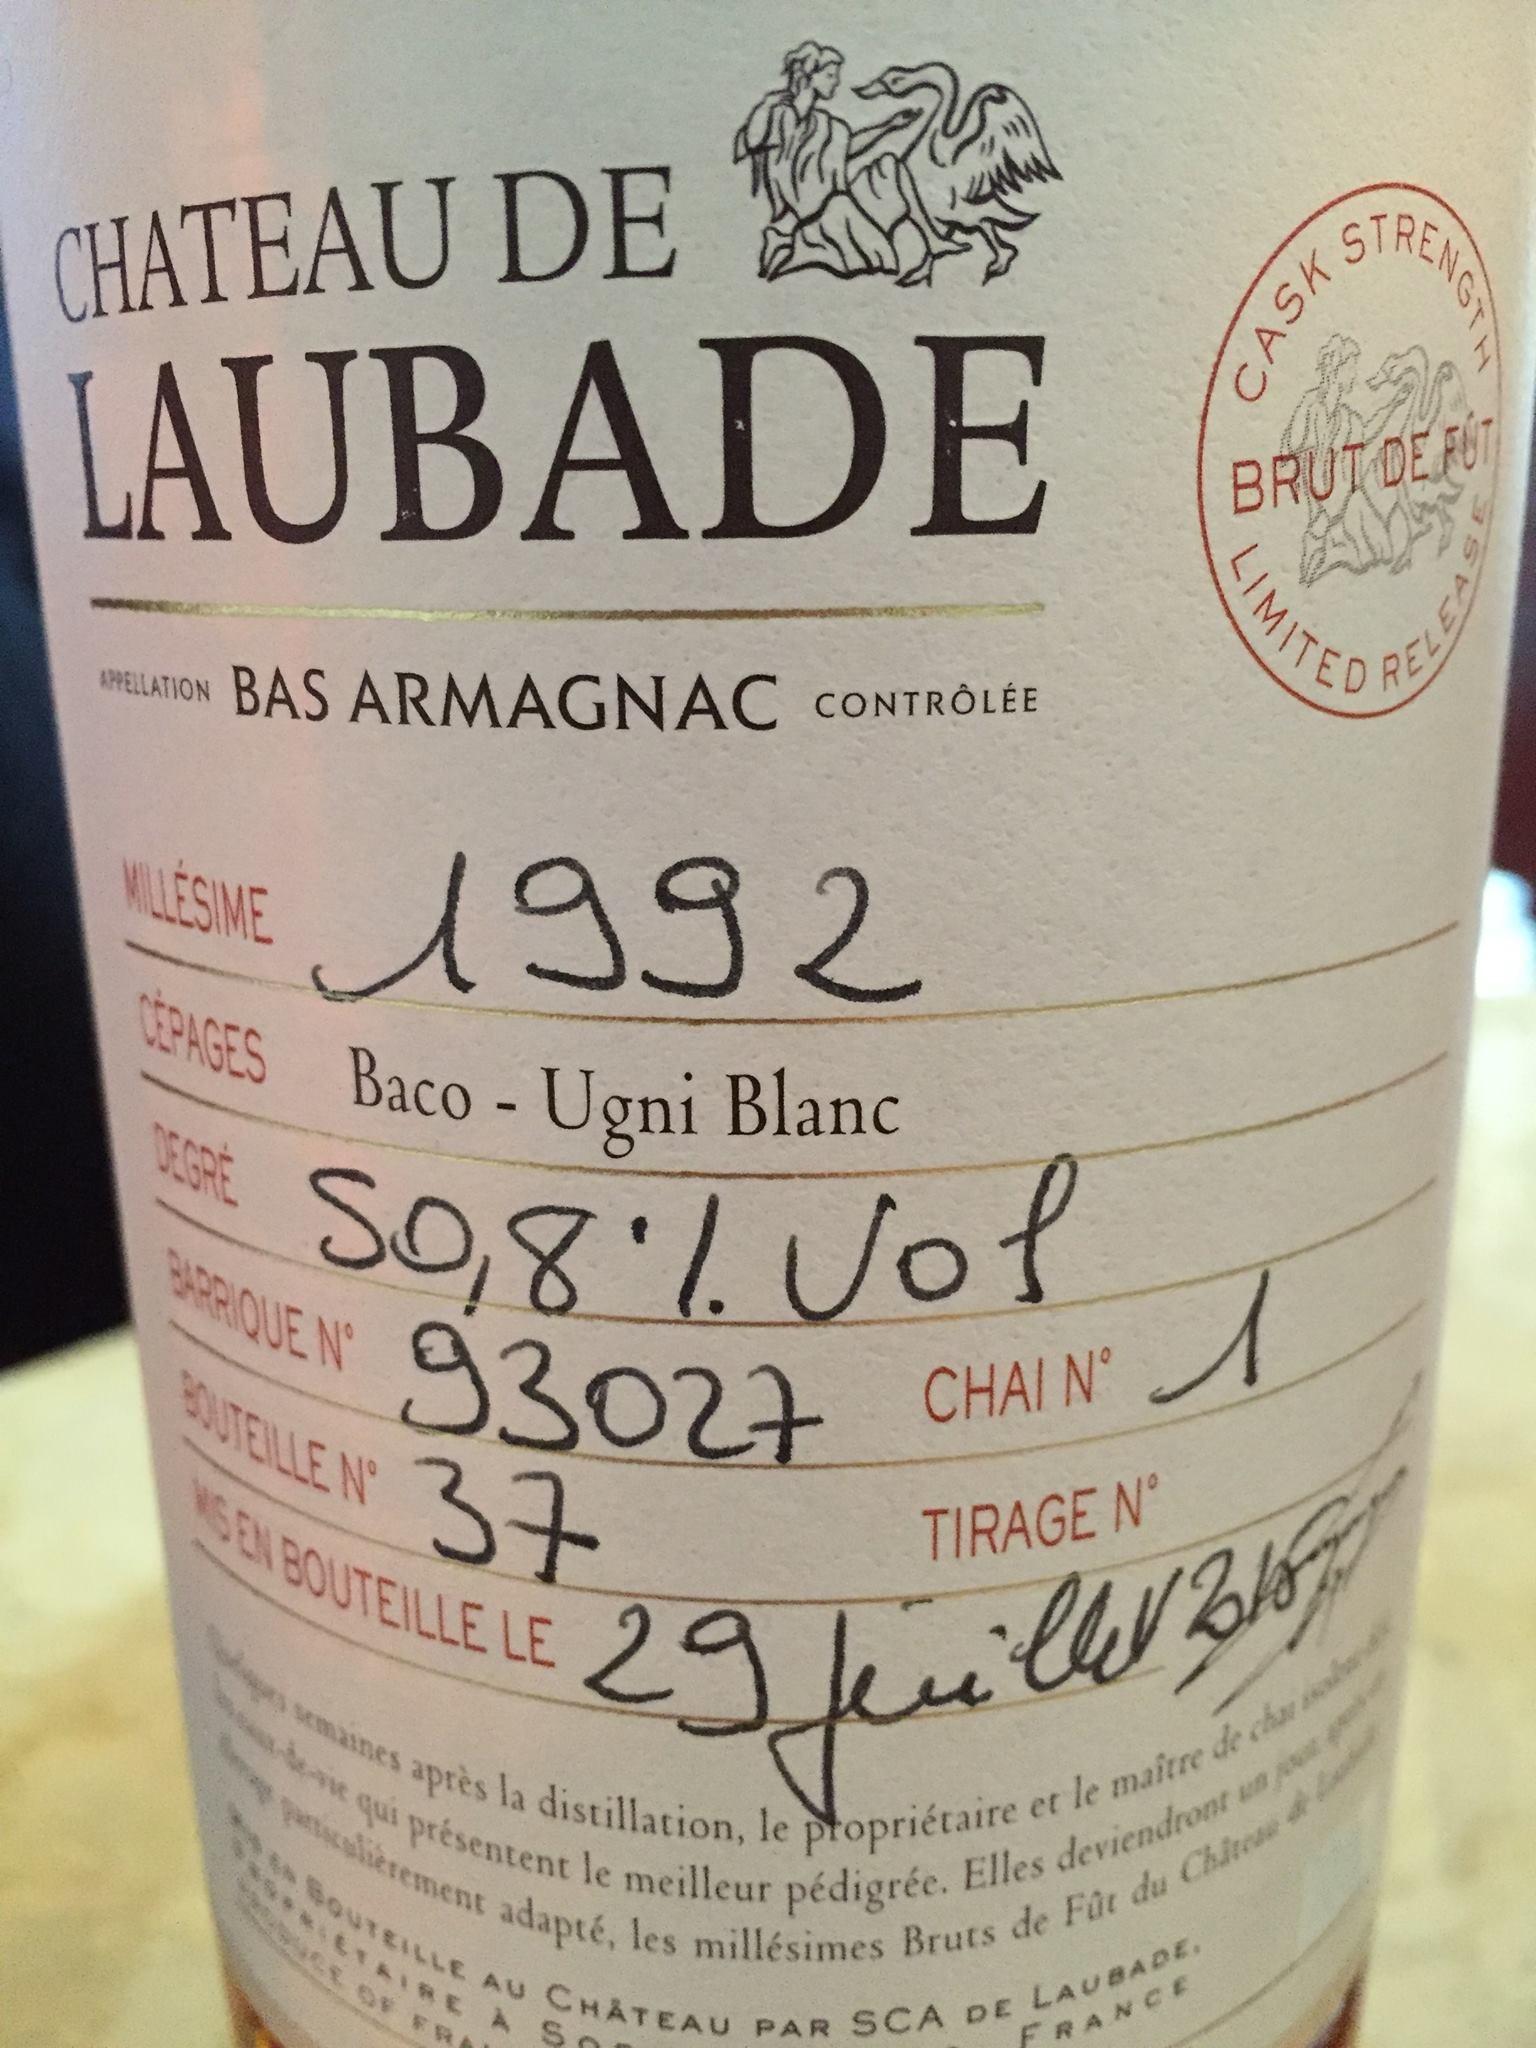 Château de Laubade 1992 – Brut de Fût / Cask Strength – Bas-Armagnac